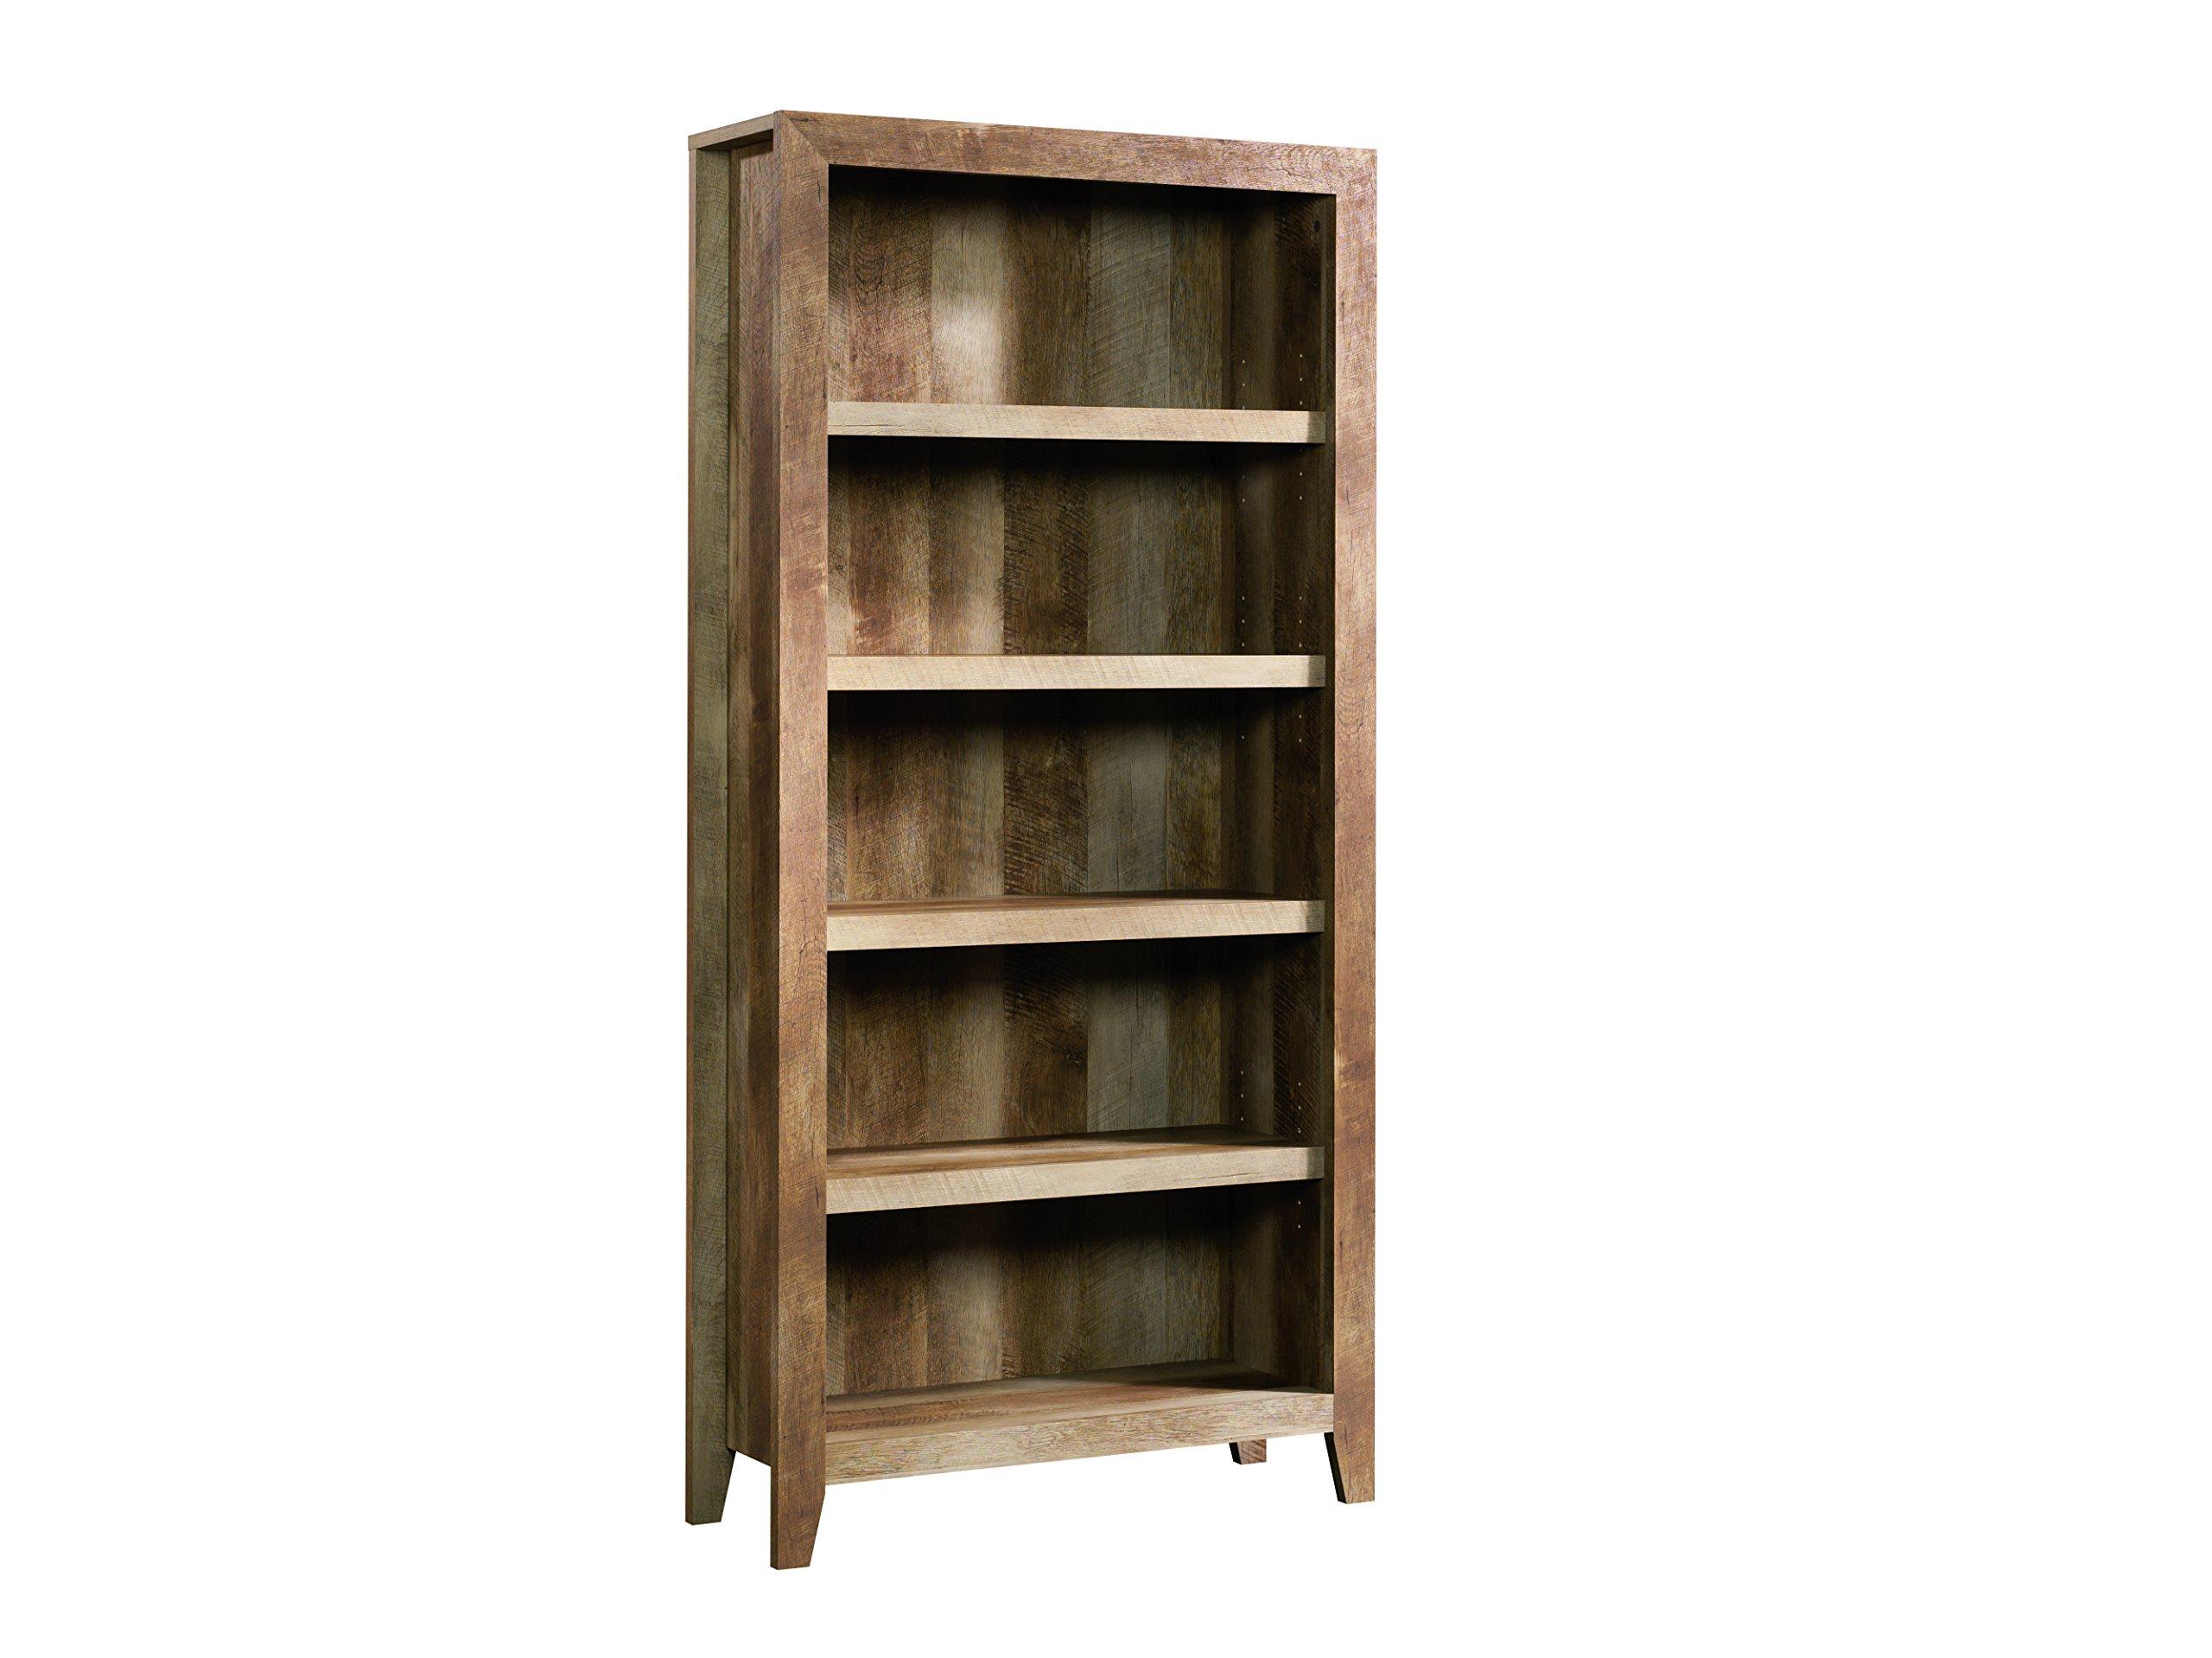 Sauder 418546 Dakota Pass 5-Shelf Bookcase, L: 33.78'' x W: 12.52'' x H: 71.1, Craftsman Oak finish by Sauder (Image #2)